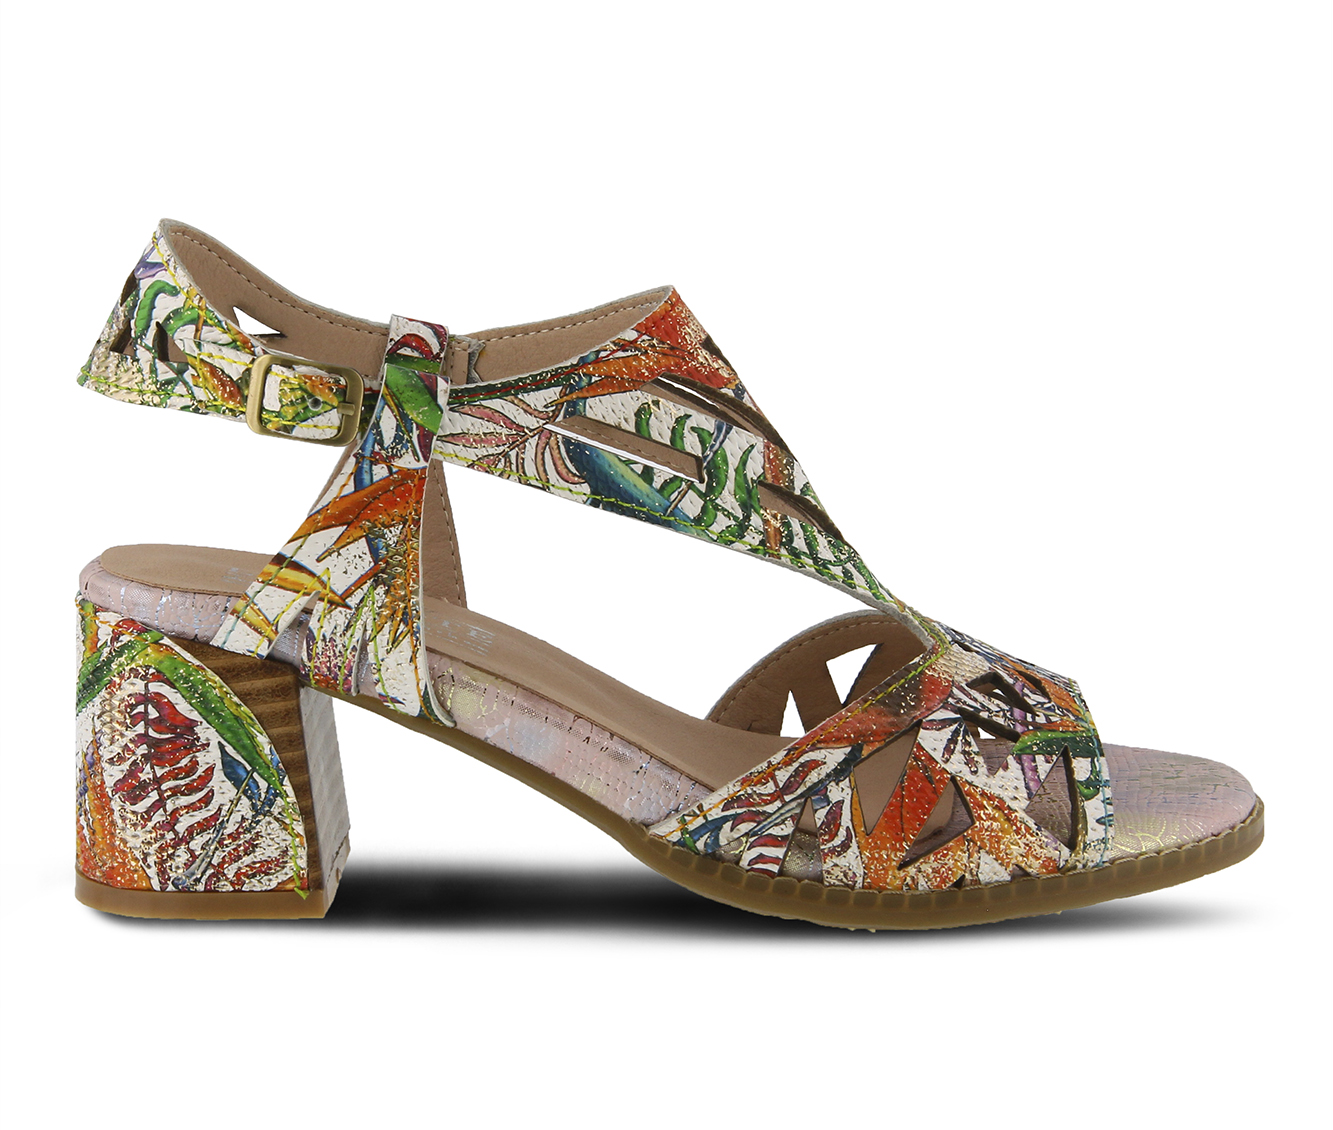 L'Artiste Calpie Women's Dress Shoe (Orange Leather)